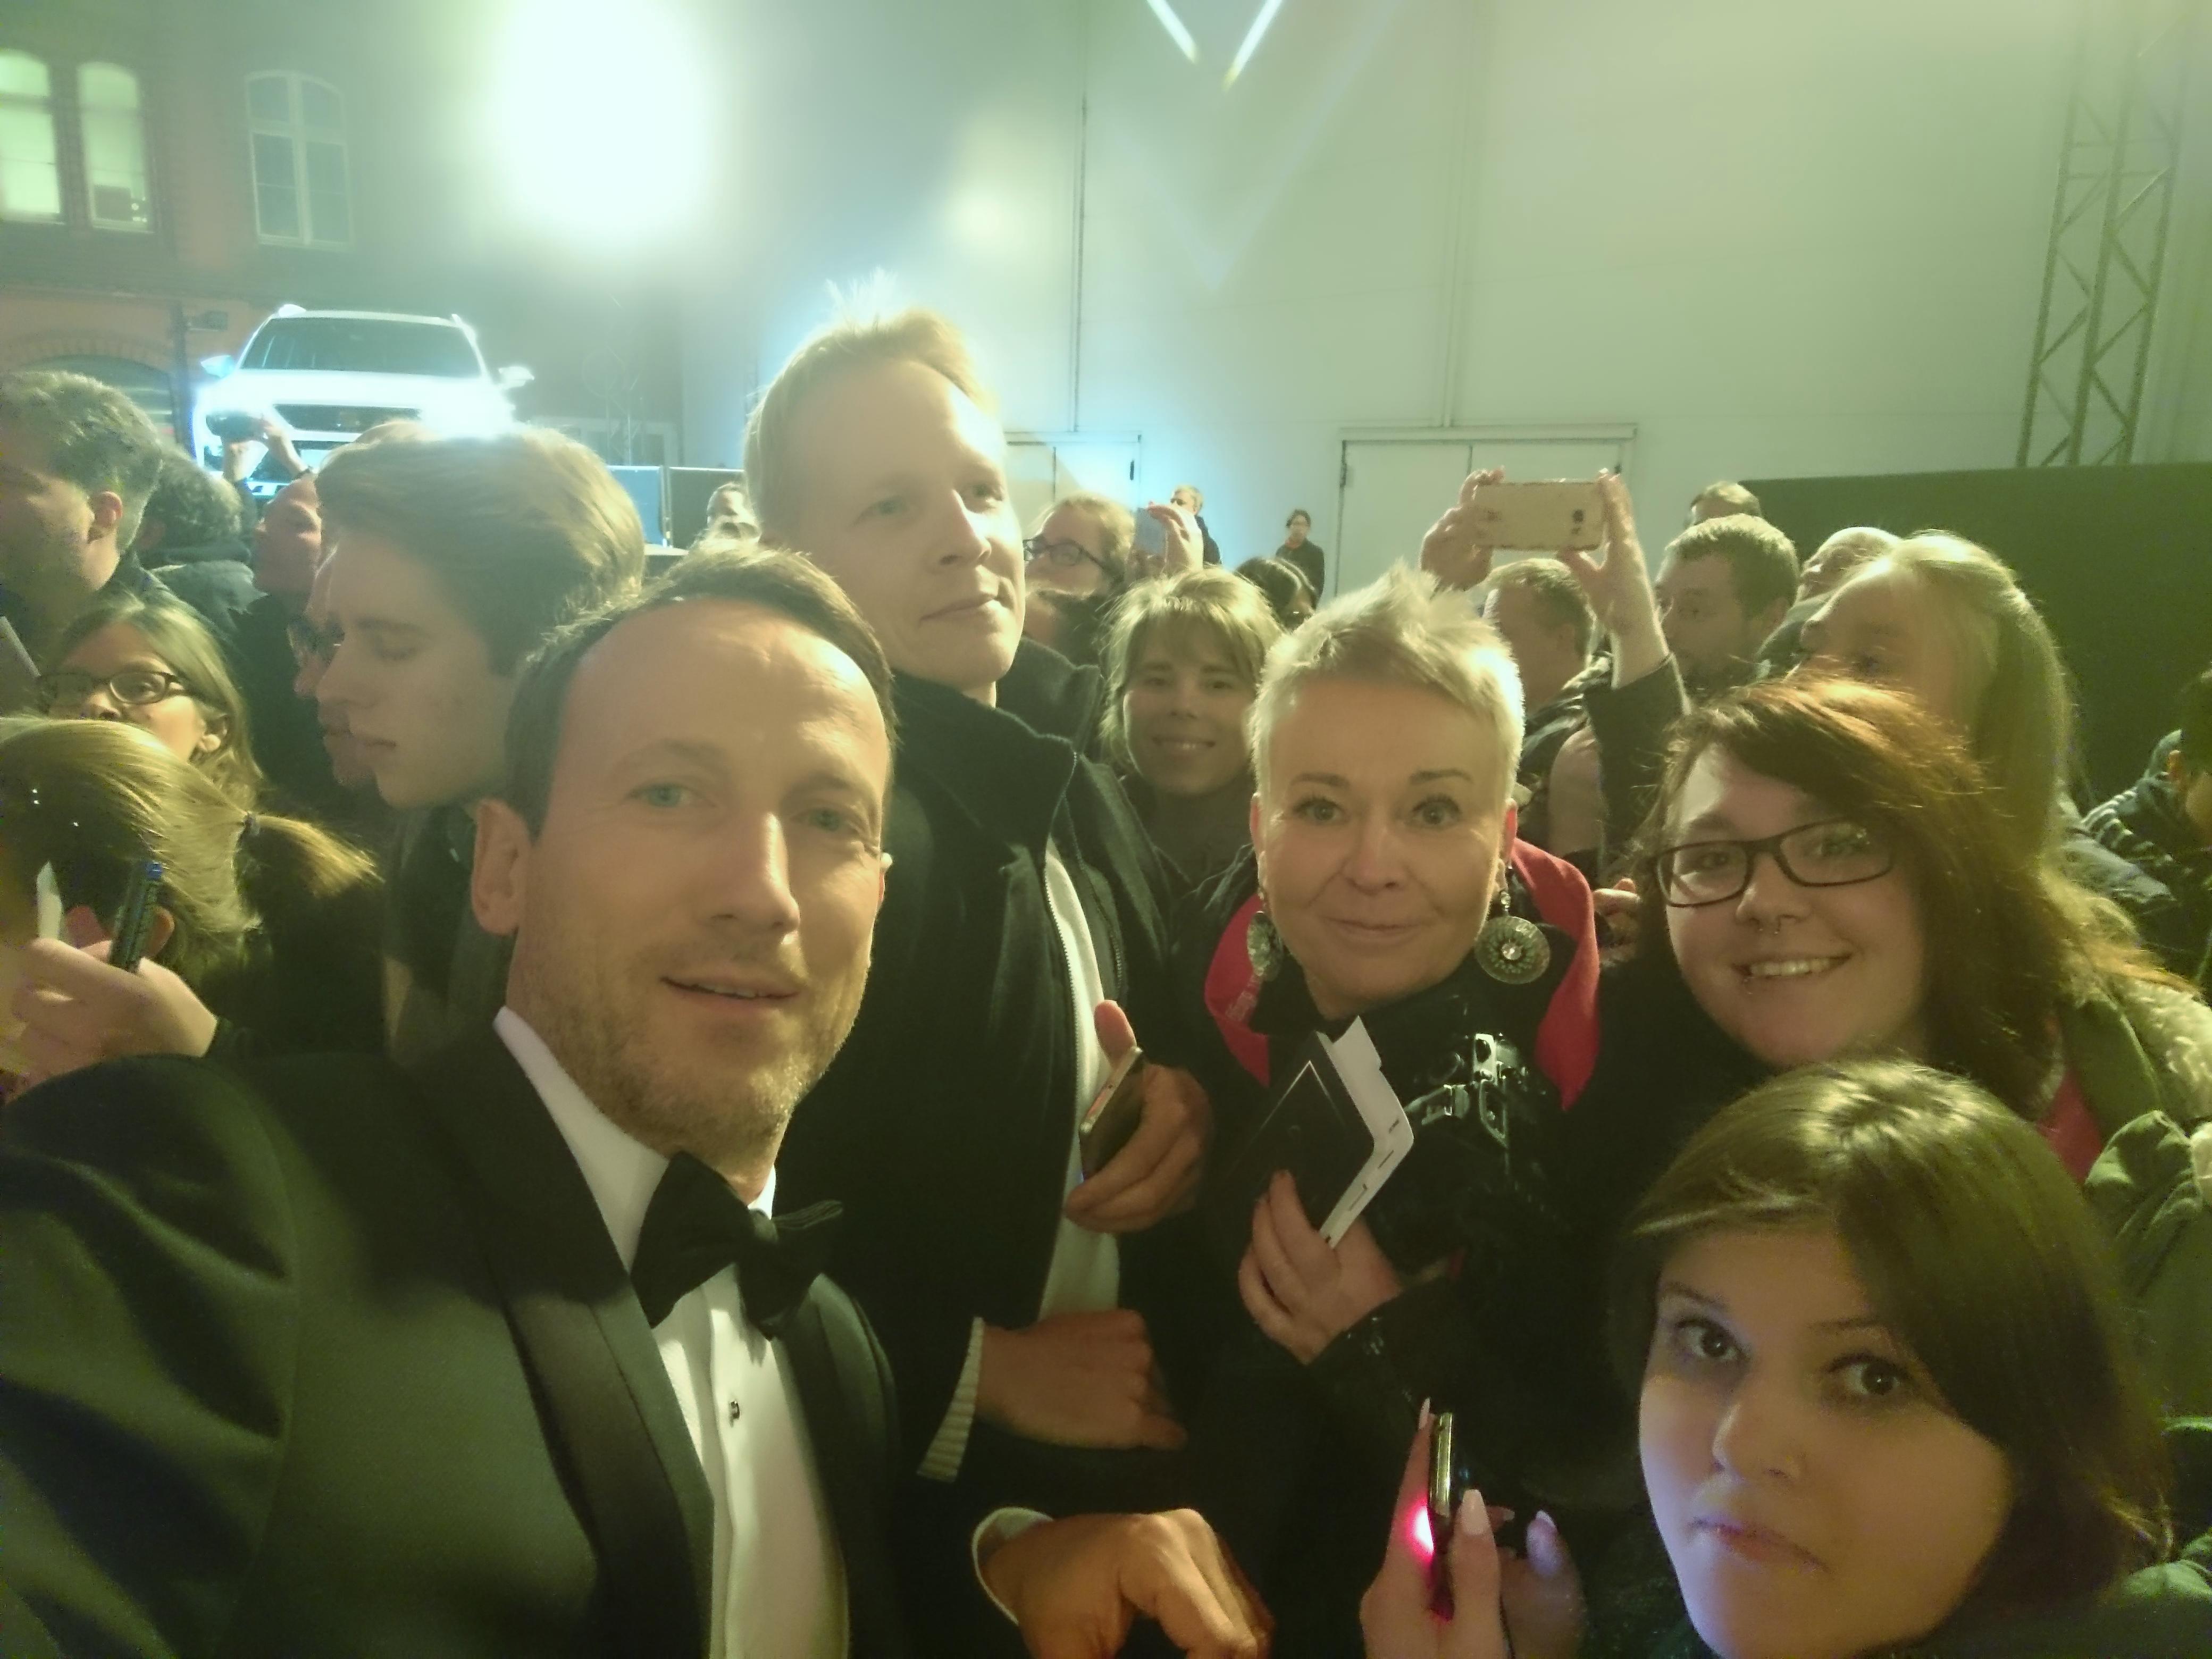 Tatort, Hamburg, Wotan Wilke Möhing, HEIDI VOM LANDE, Bloggerin, Bergedorf Blog, Tatort-Folge, Dunkle Zeit, News, Insiderwissen